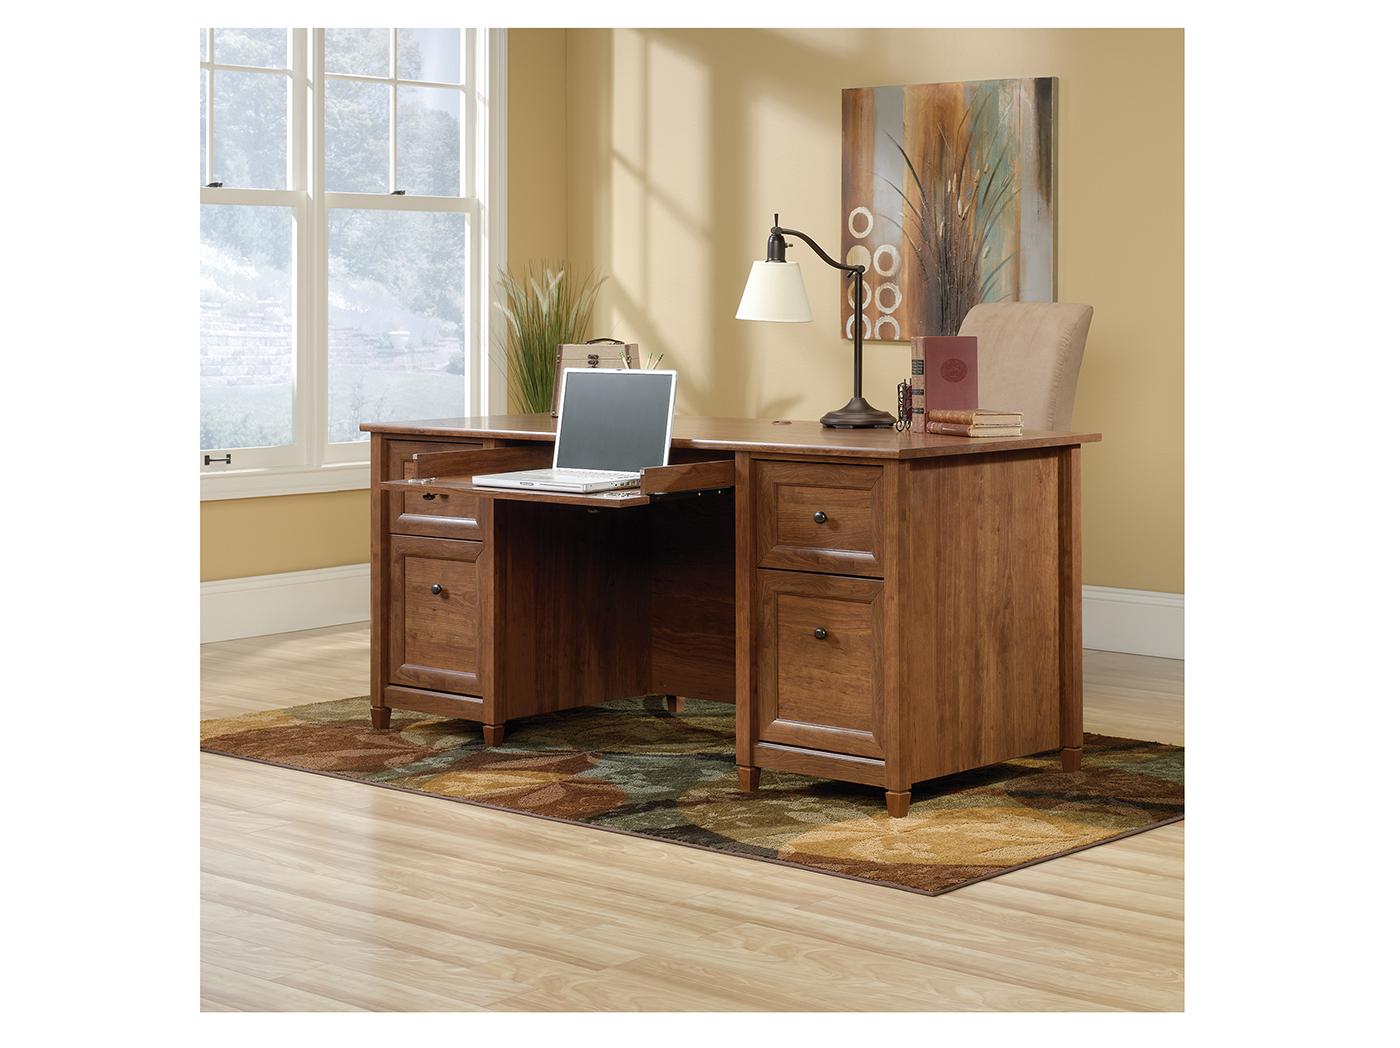 Edge Water Auburn Cherry Executive Desk